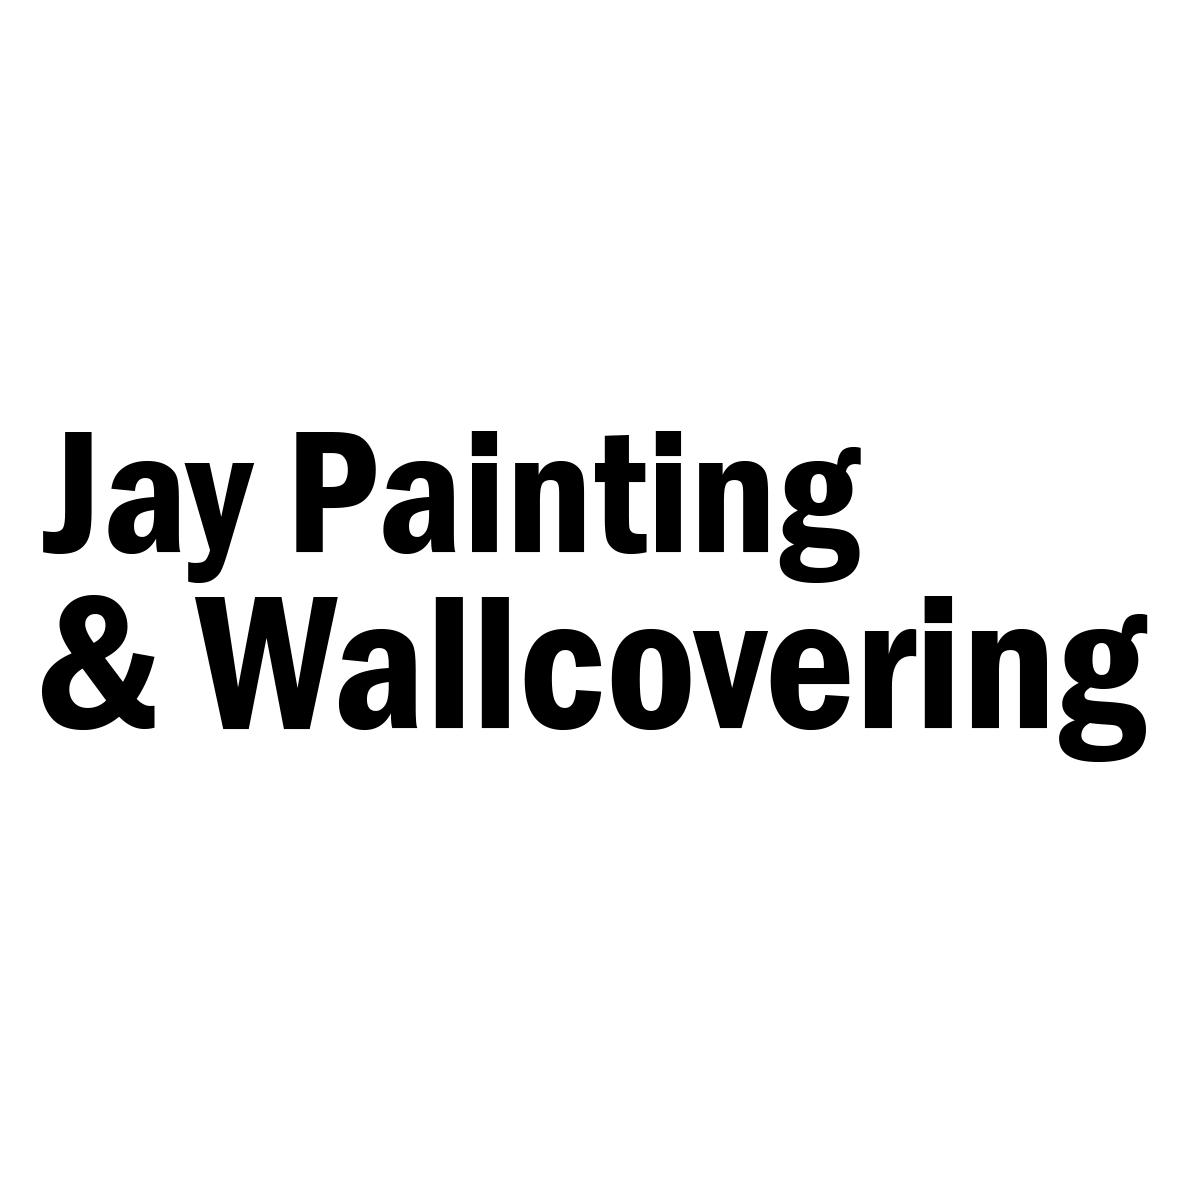 Jay Painting & Wallcovering